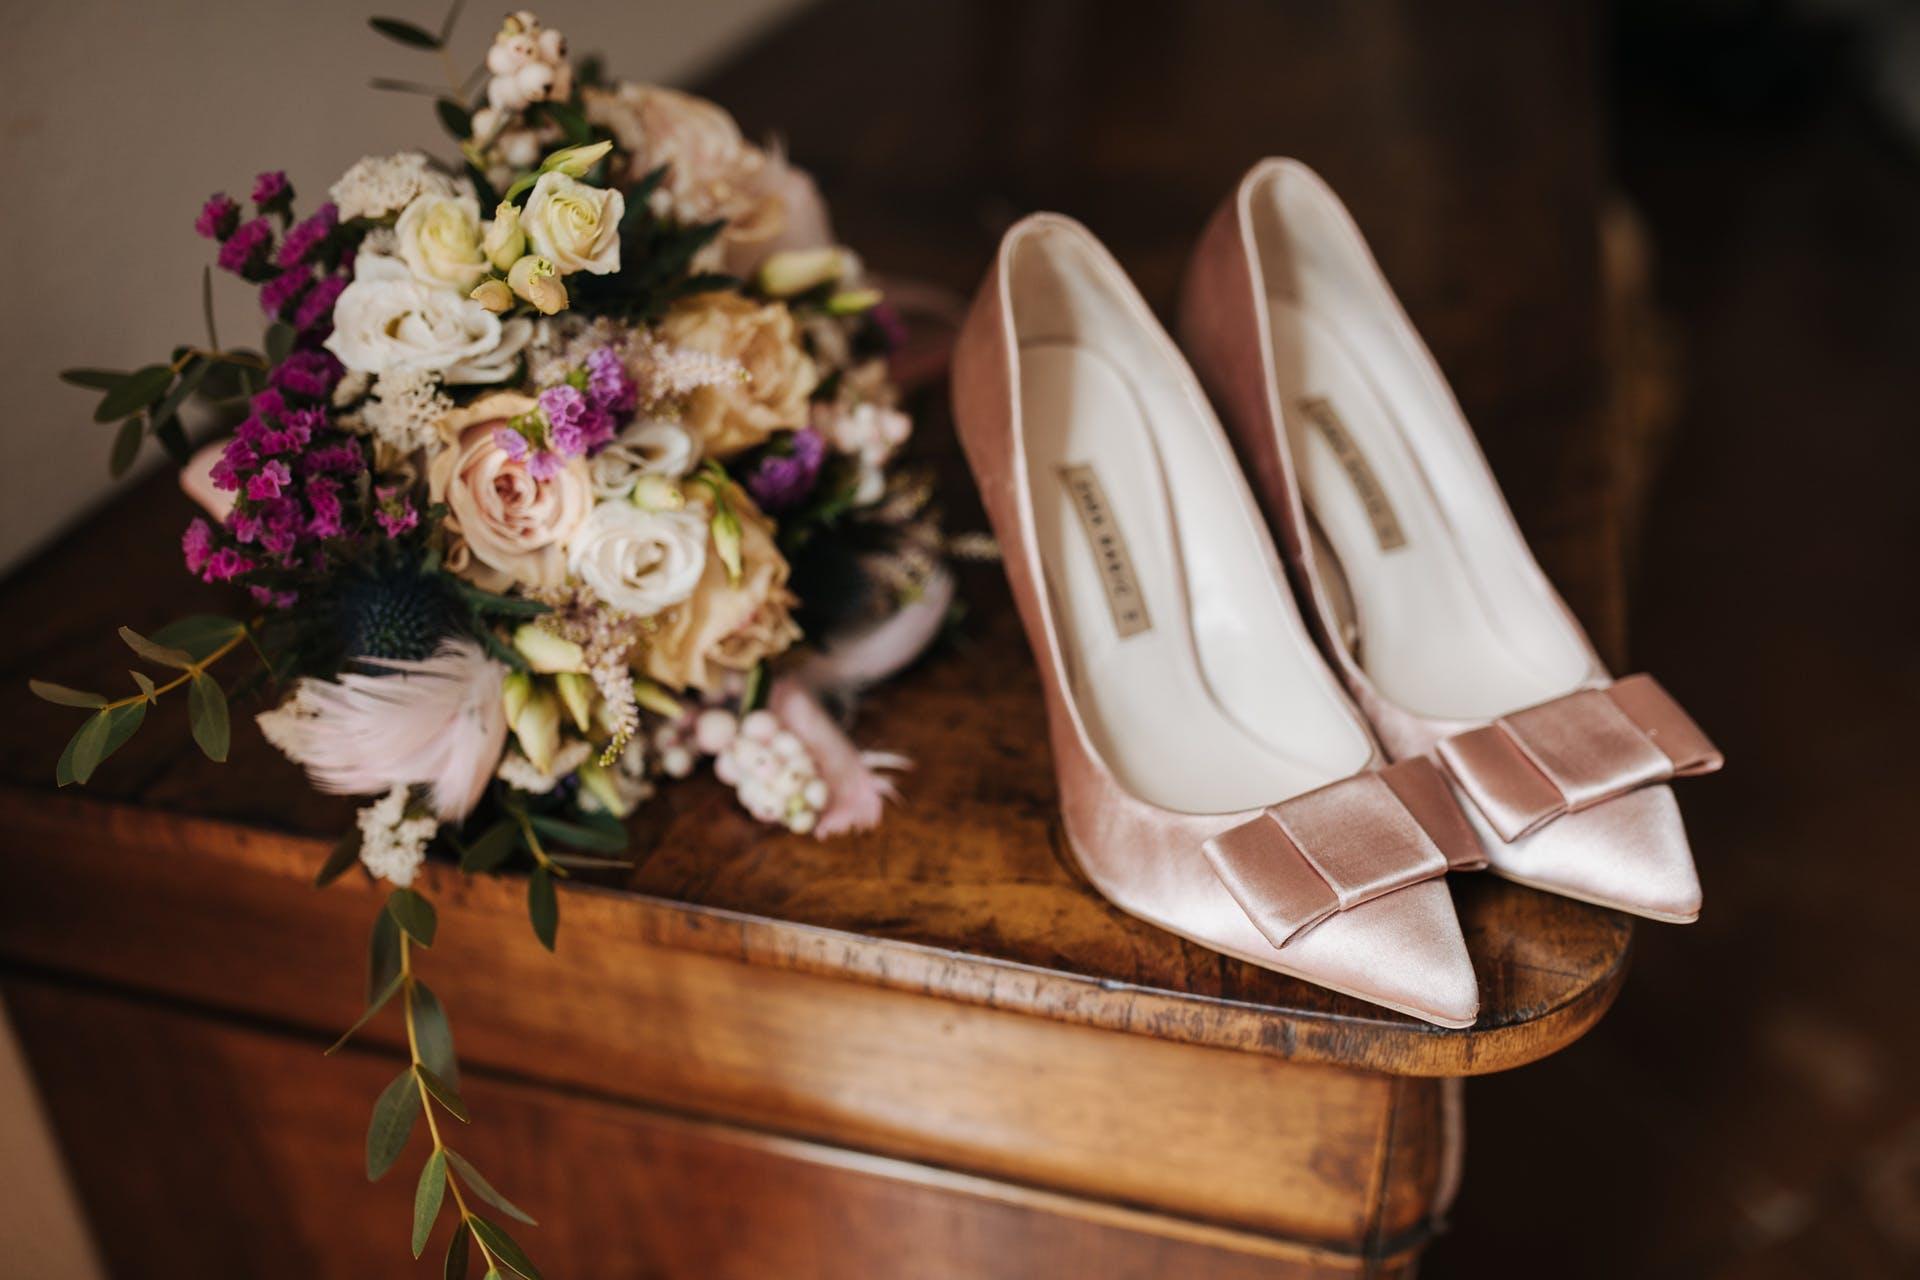 bouquet getting ready wedding details